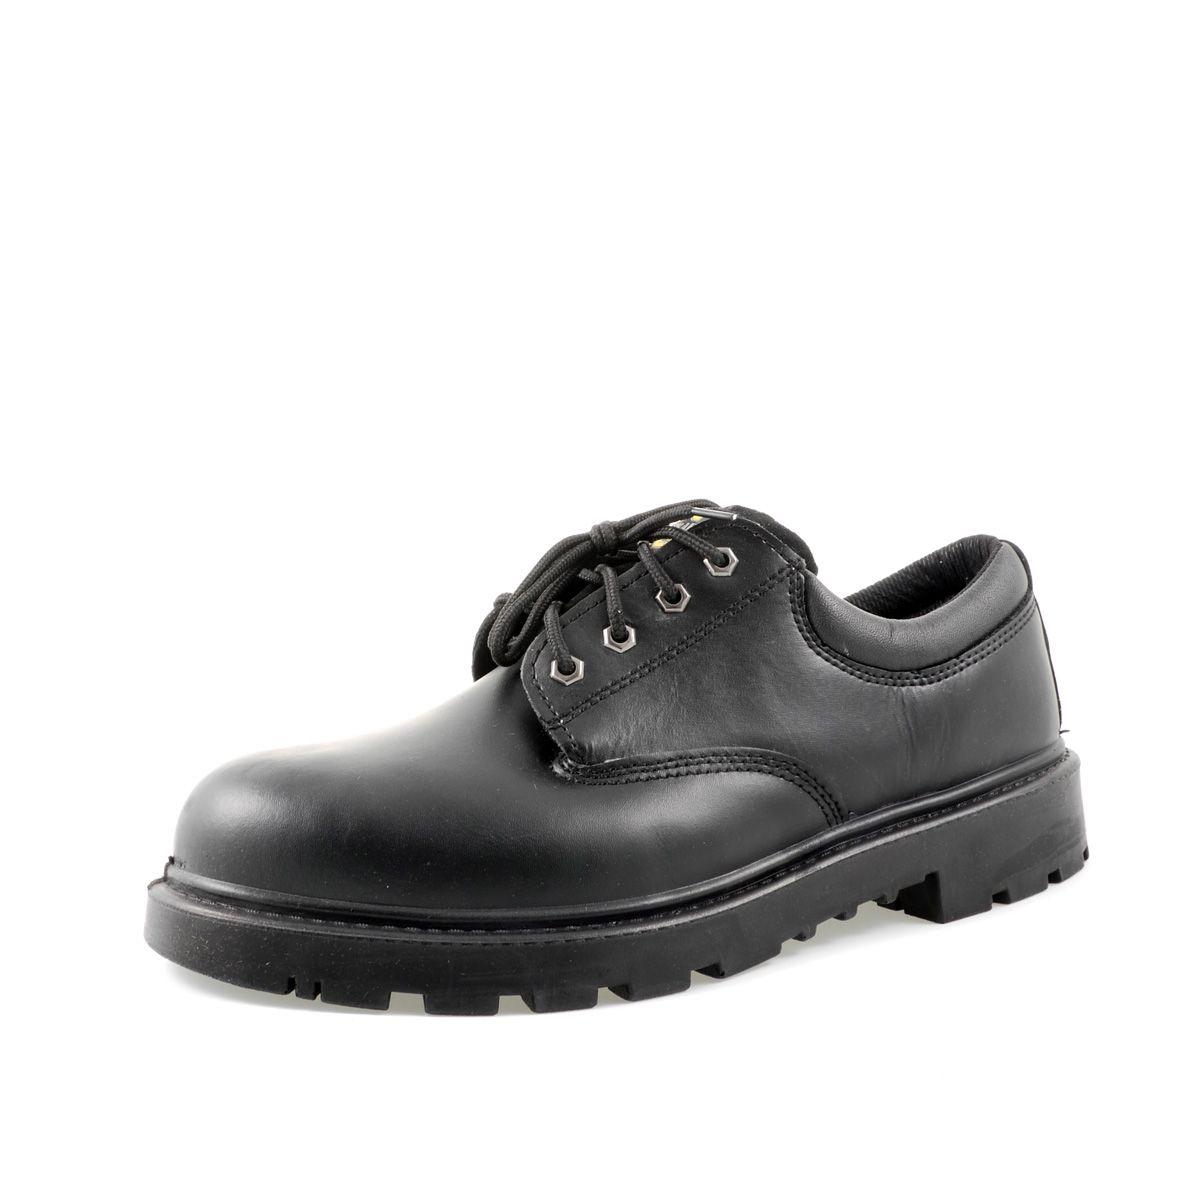 pin chaussures de s curit grande taille basses on pinterest. Black Bedroom Furniture Sets. Home Design Ideas